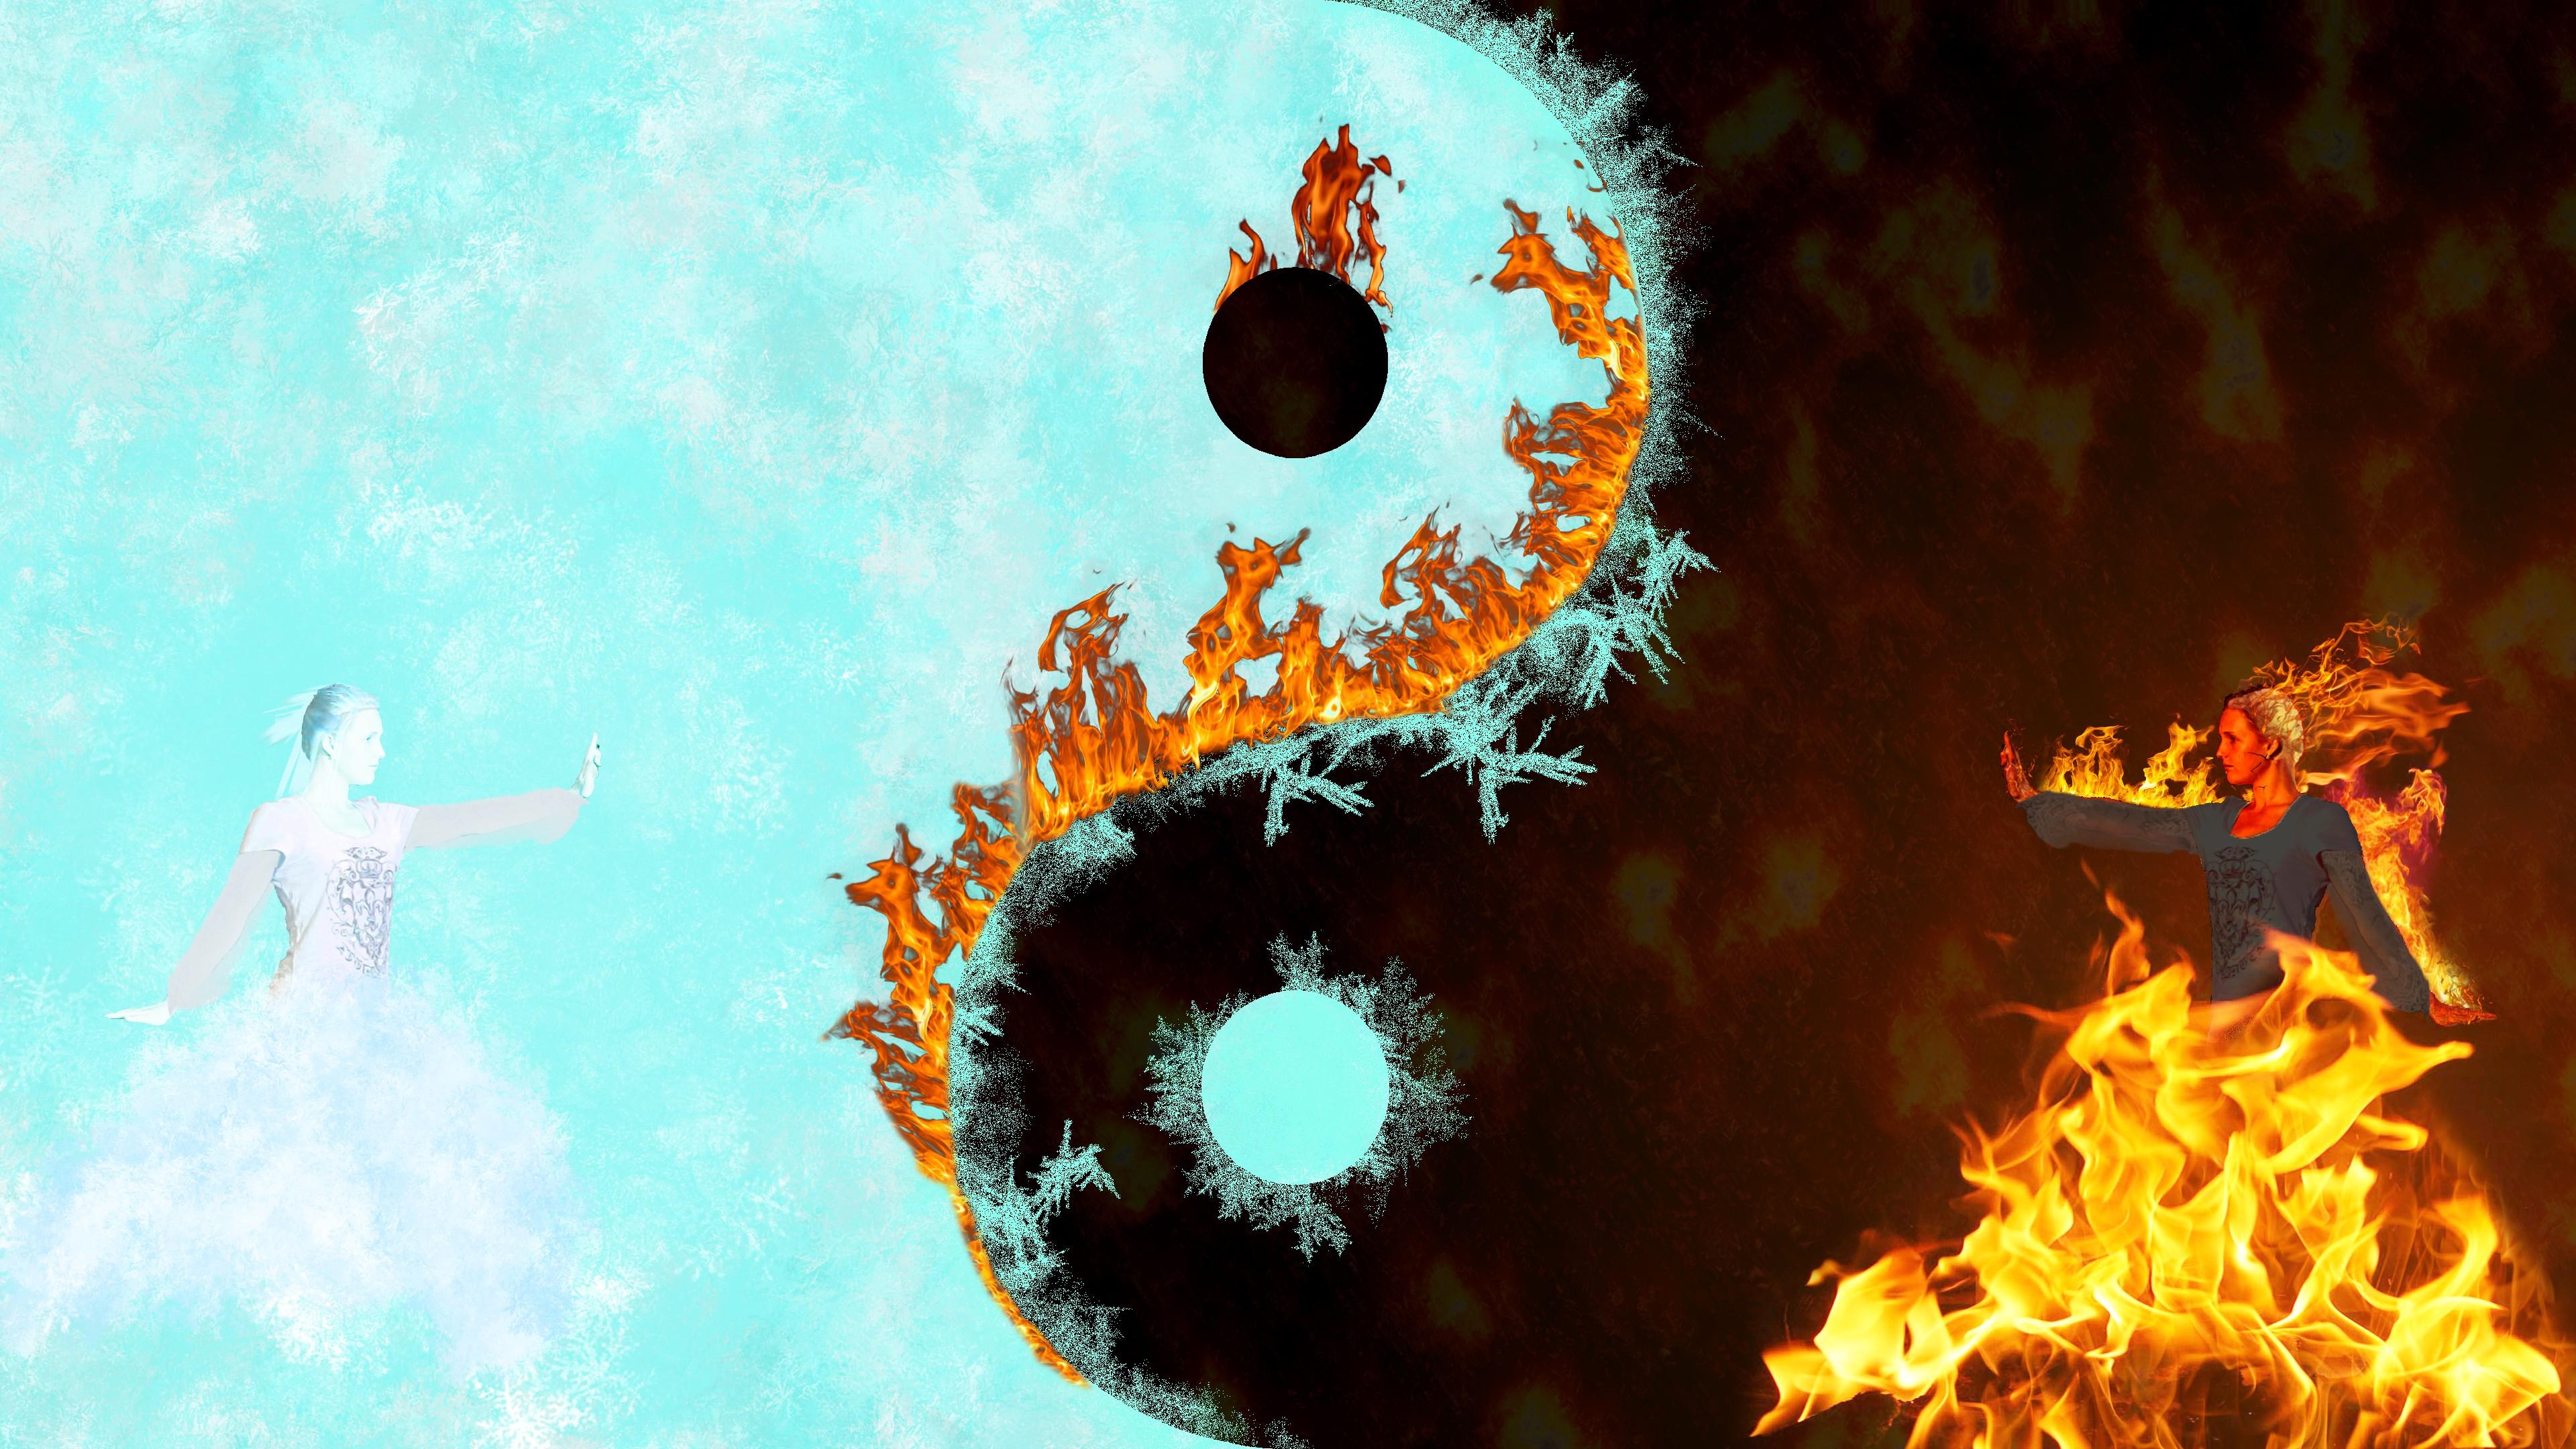 Illustration Ice Fire Yin And Yang Screenshot Computer Wallpaper